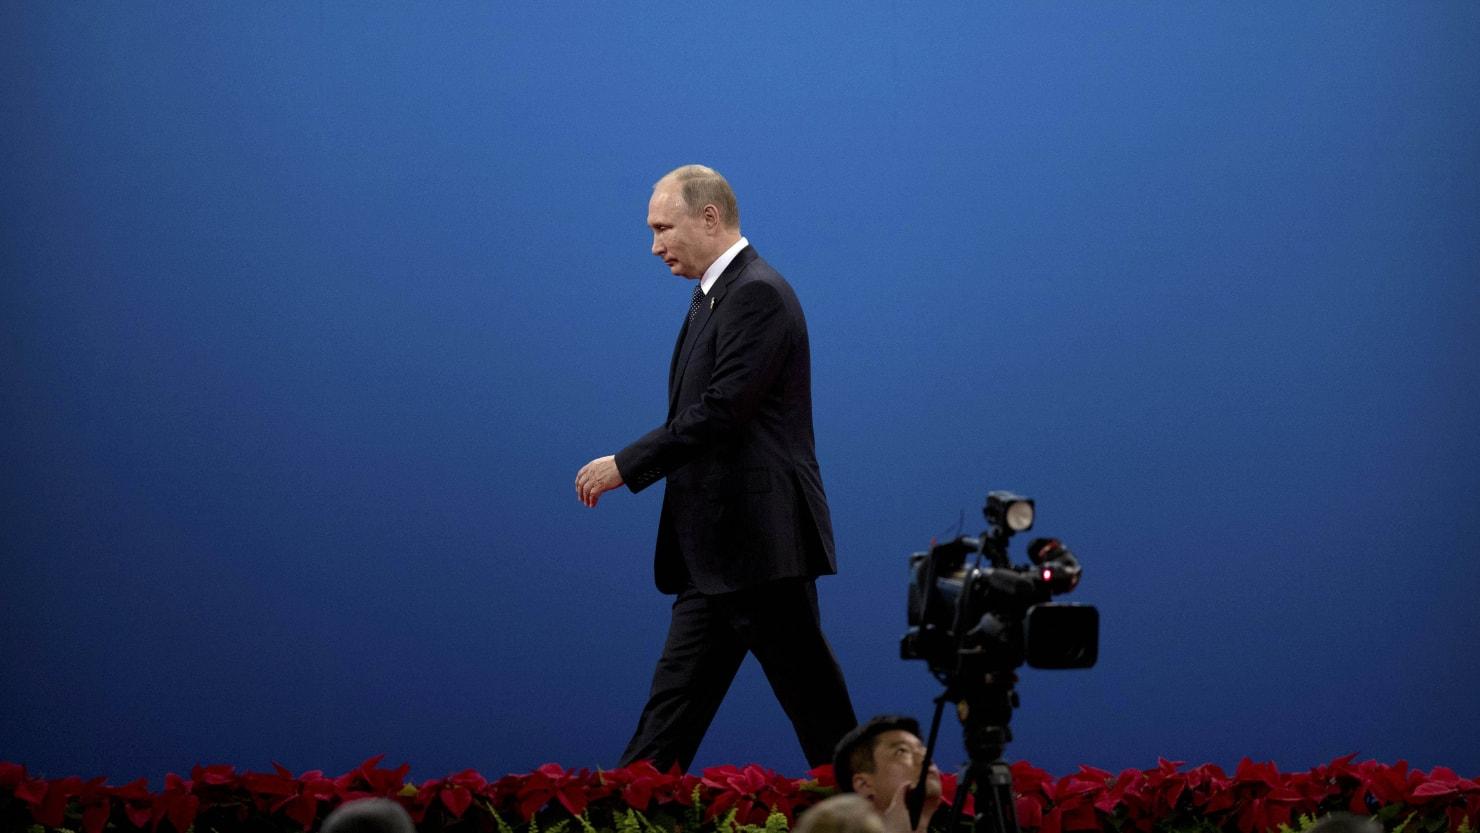 Putin Ramps Up RT's Propaganda Budget as Poll Rating Slumps